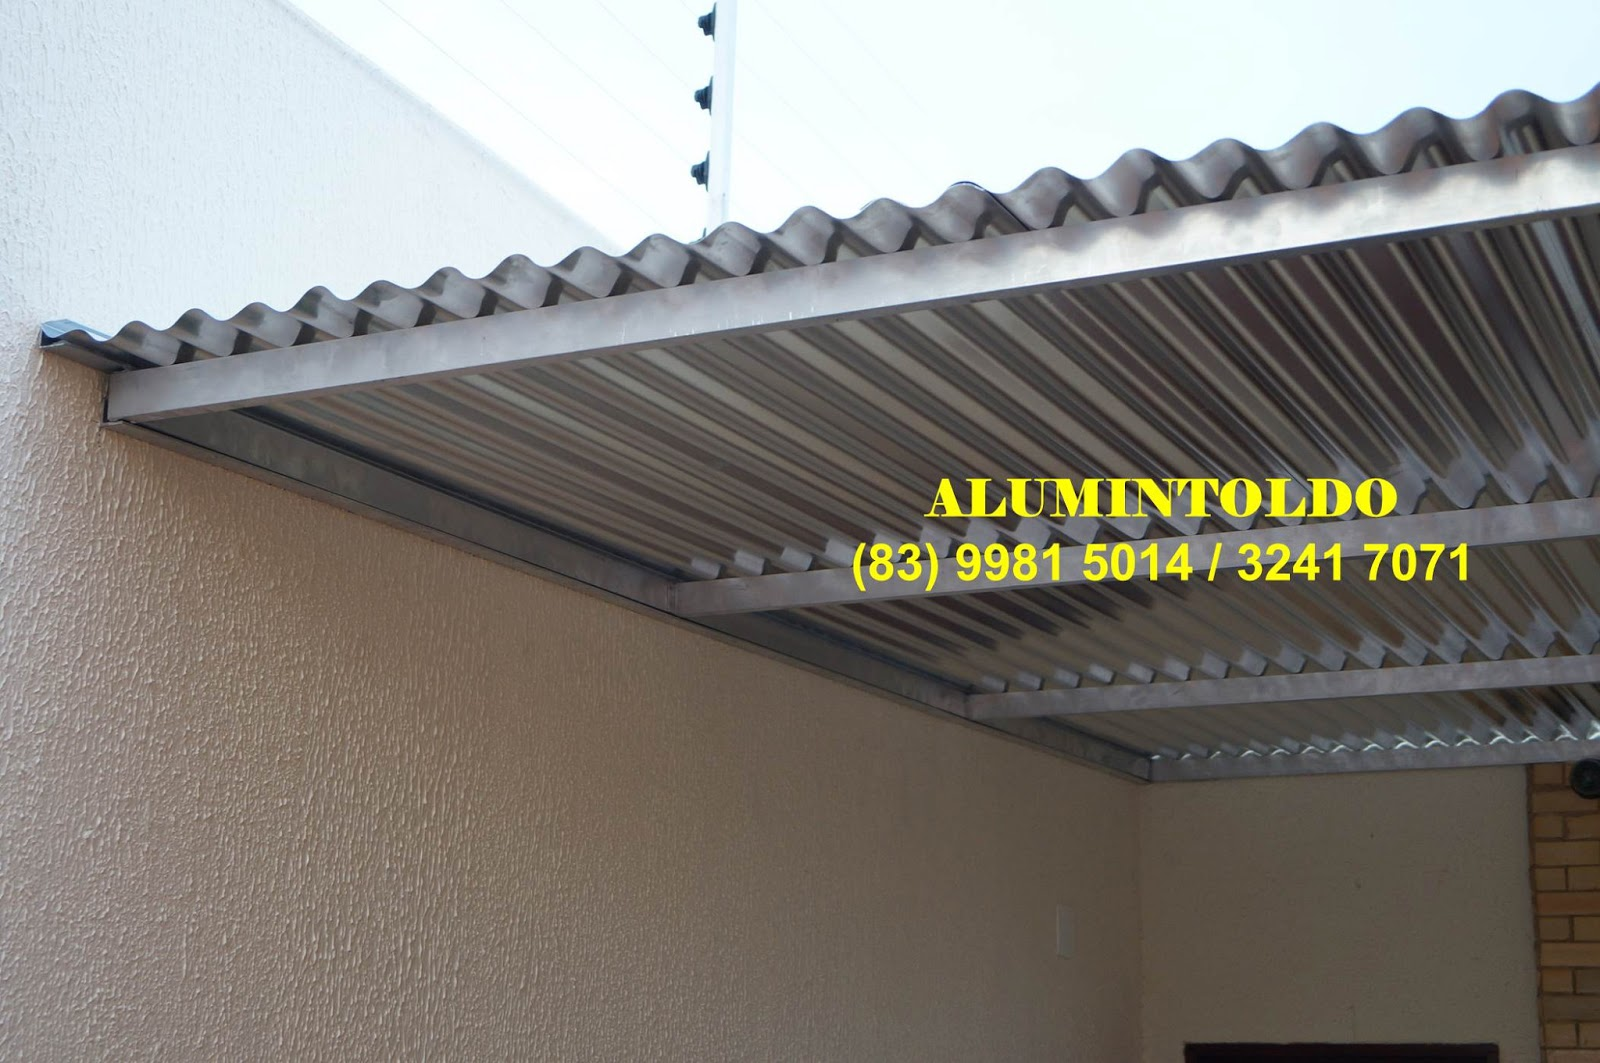 Toldo marquise em telha de alum nio for Materiales para toldos de aluminio